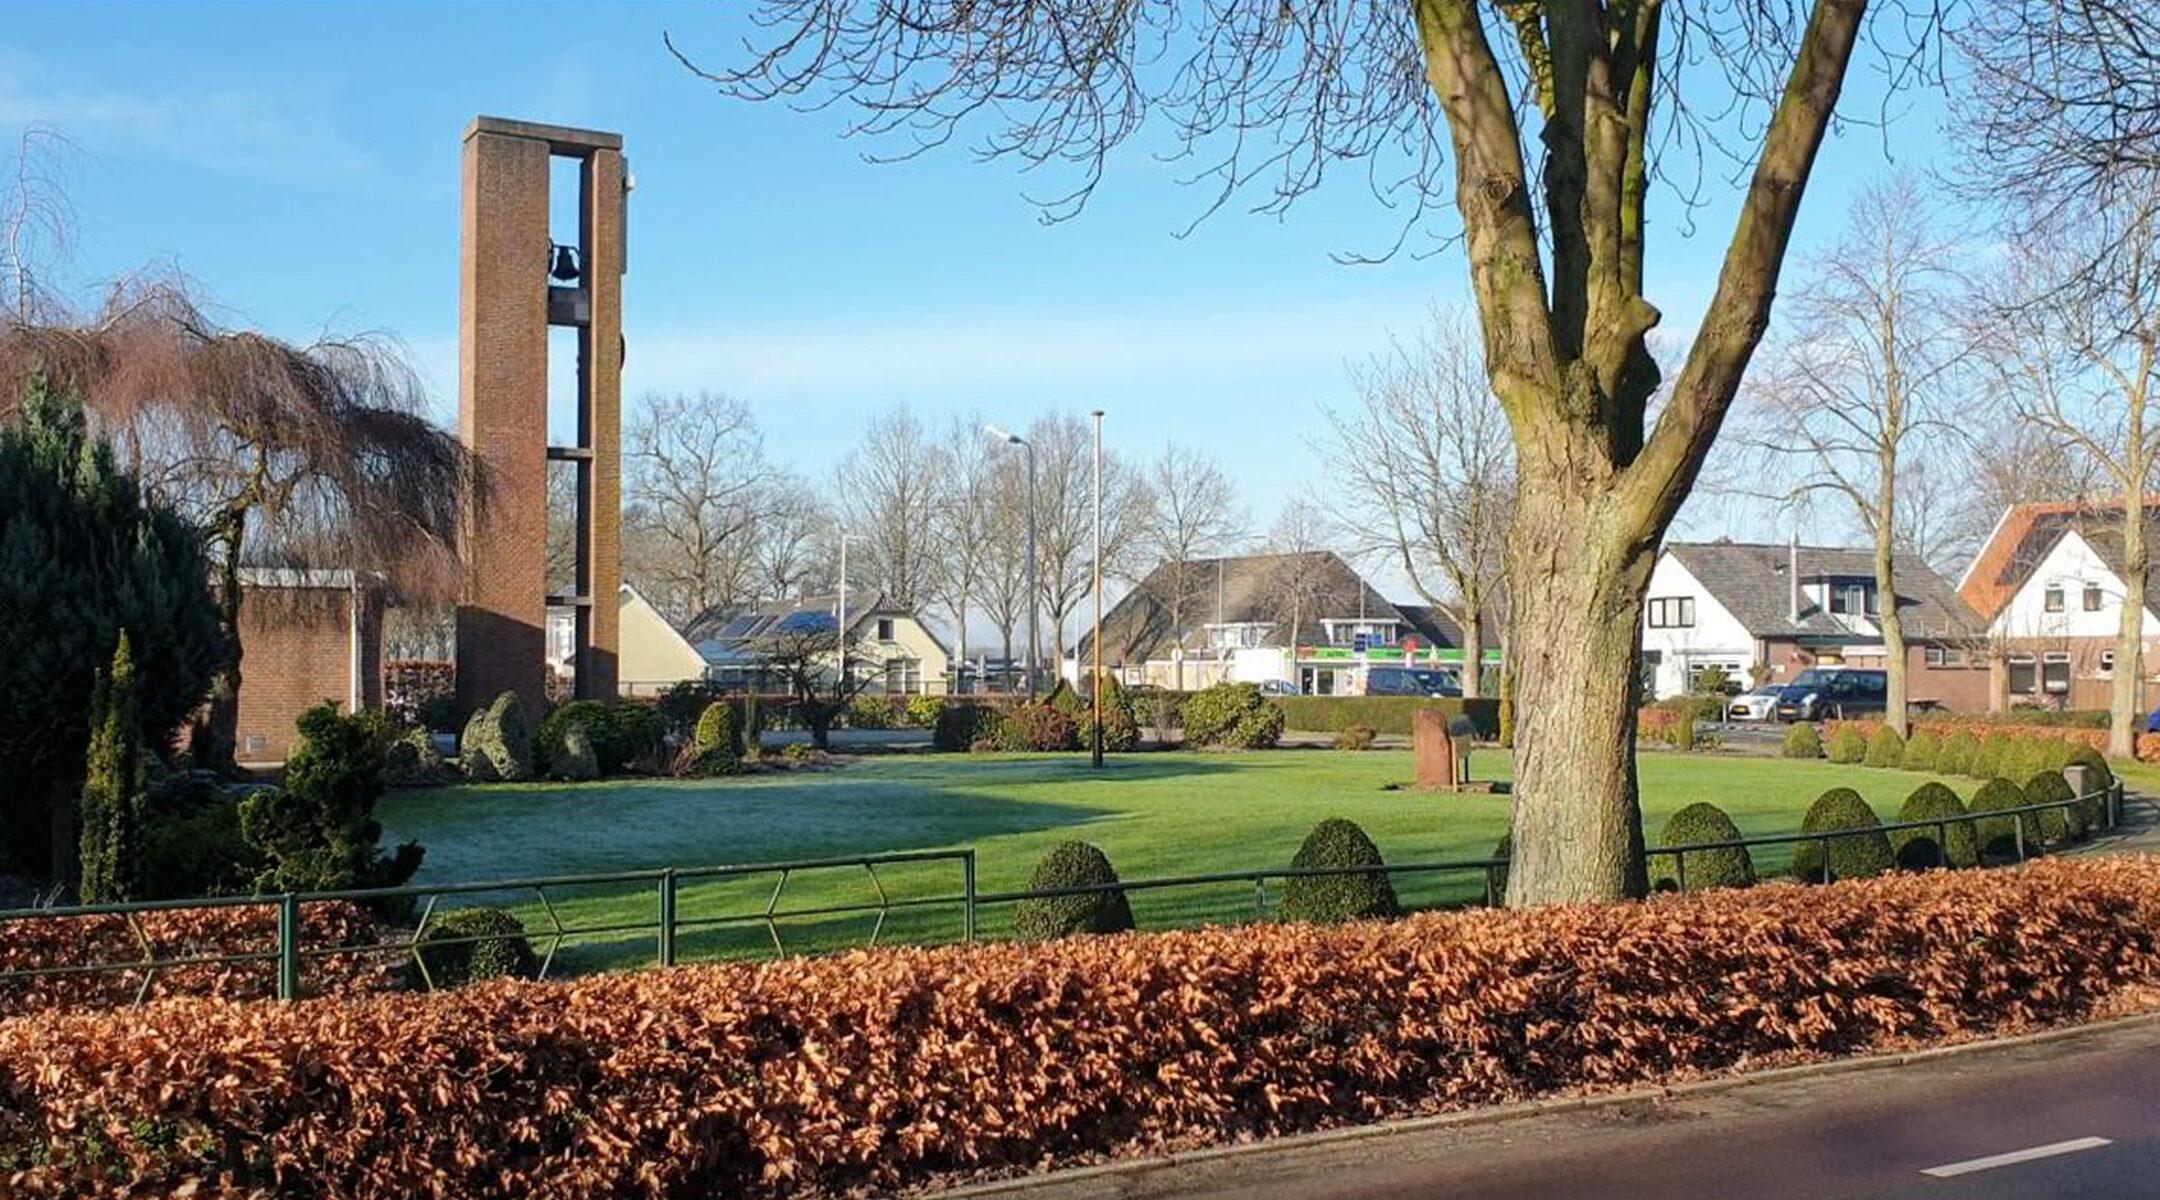 Church bells toll in Nieuwlande, the Netherlands on Jan. 25, 2021. (Cnaan Liphshiz)